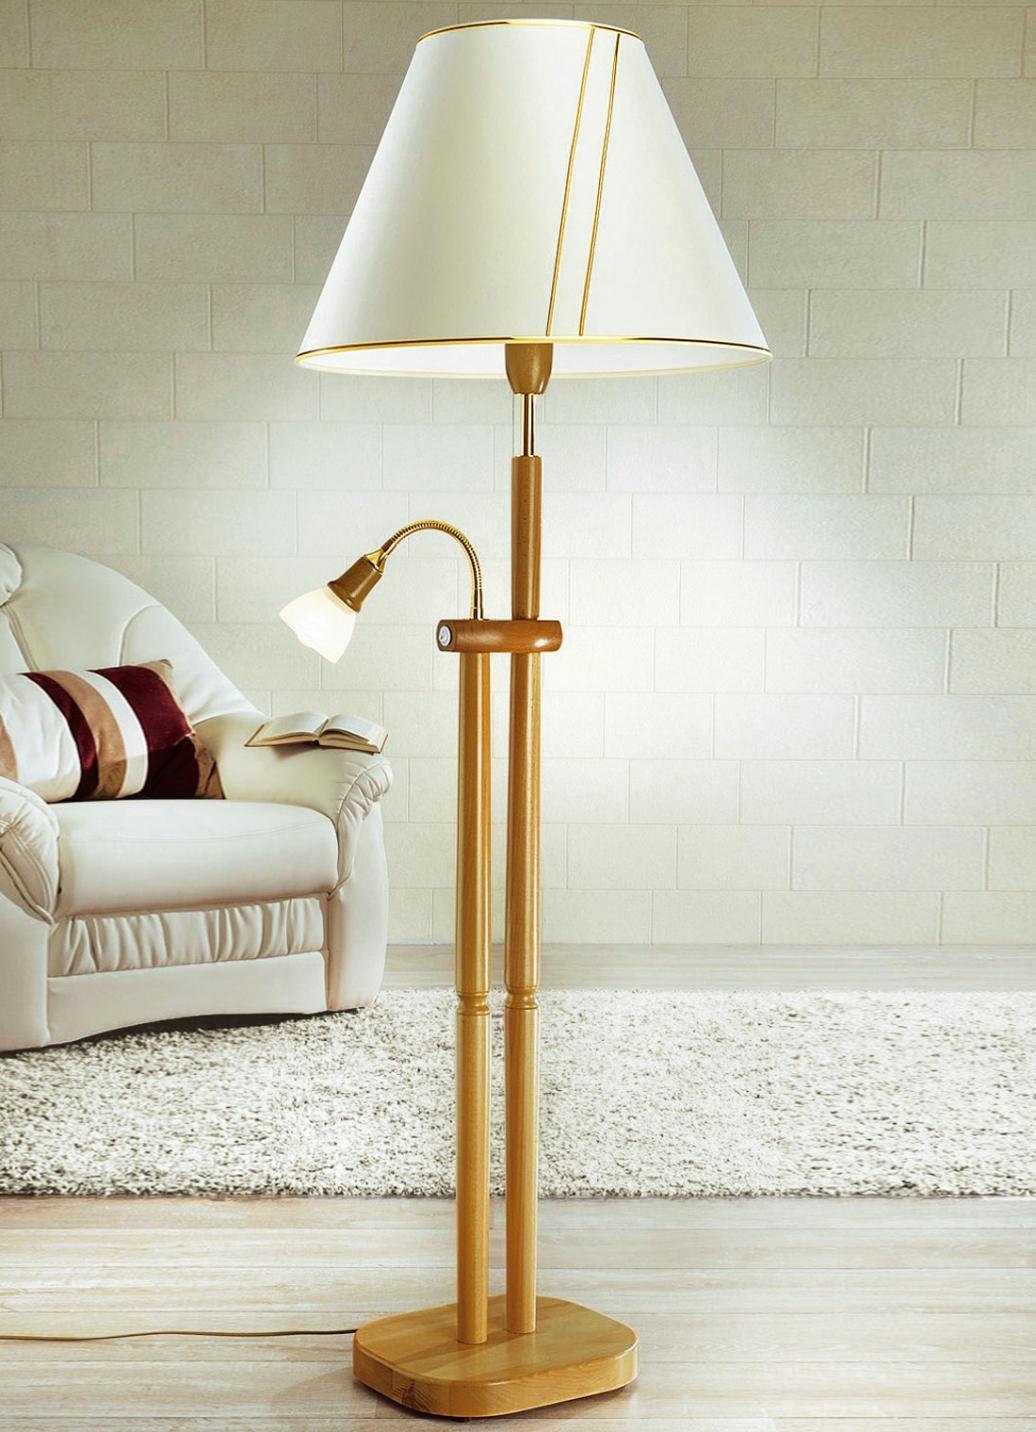 Stehlampe Leselampe Holz